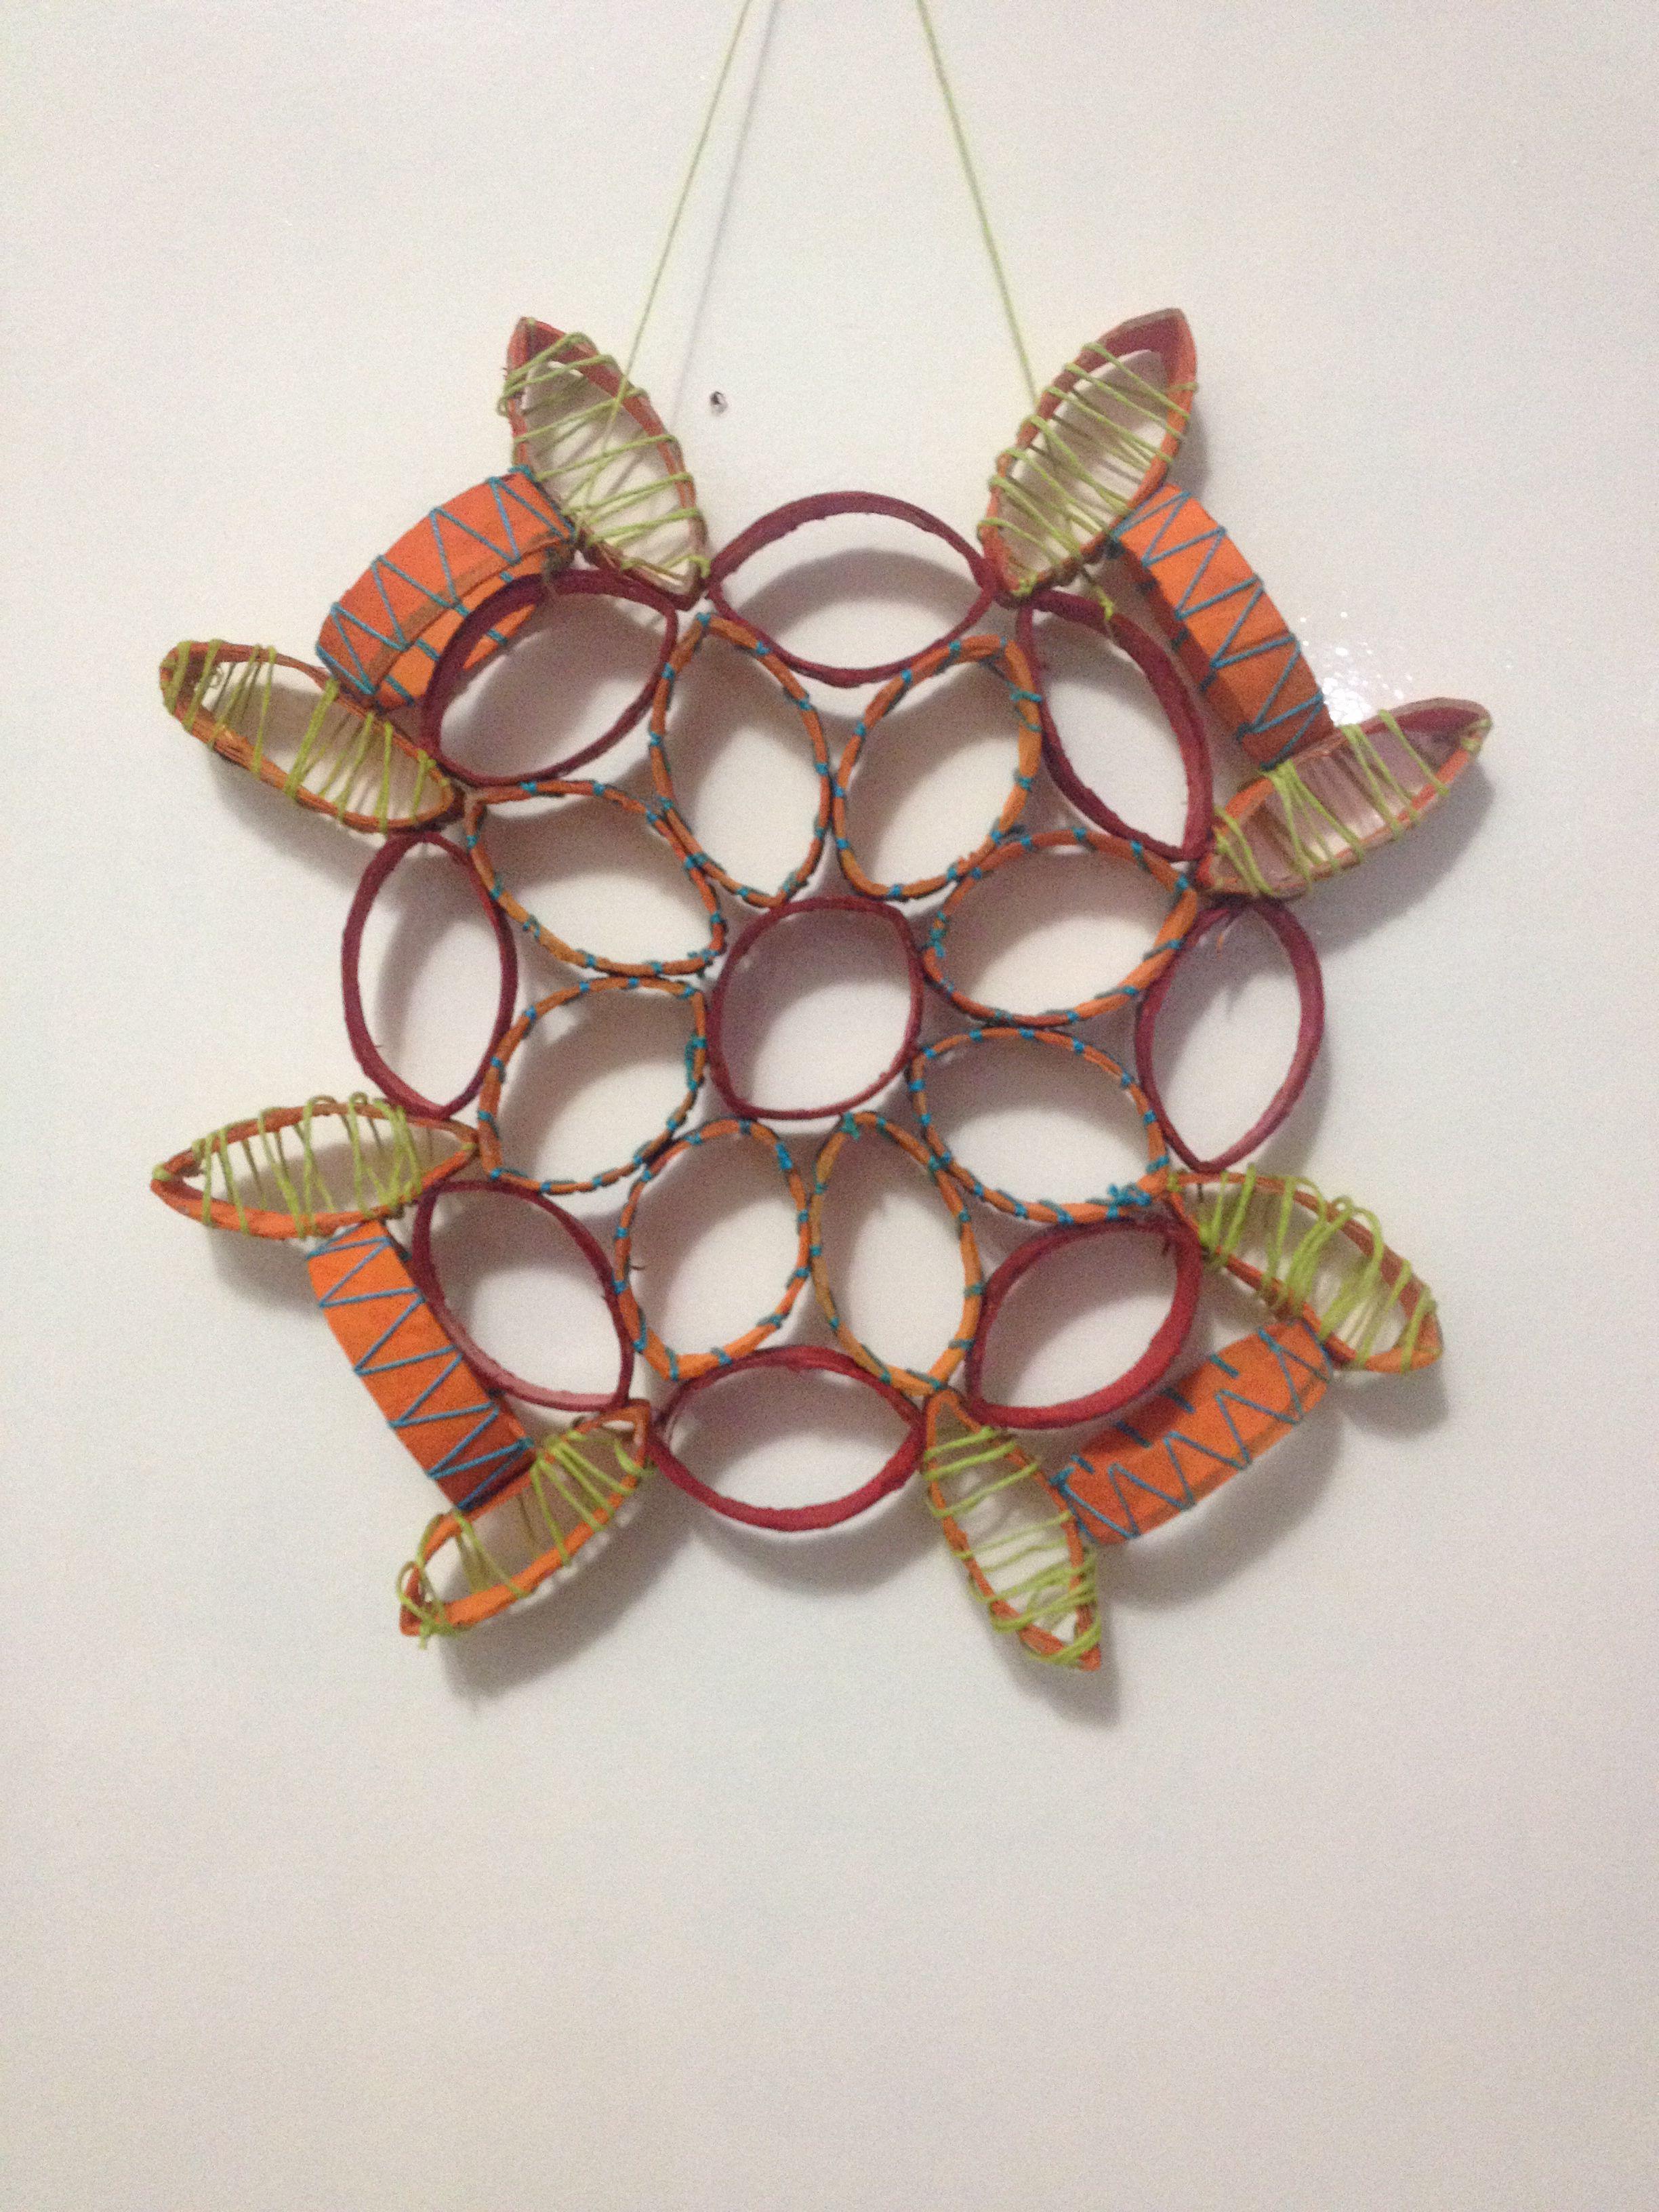 DIY Paper towel rolls ornament (With images) Paper towel